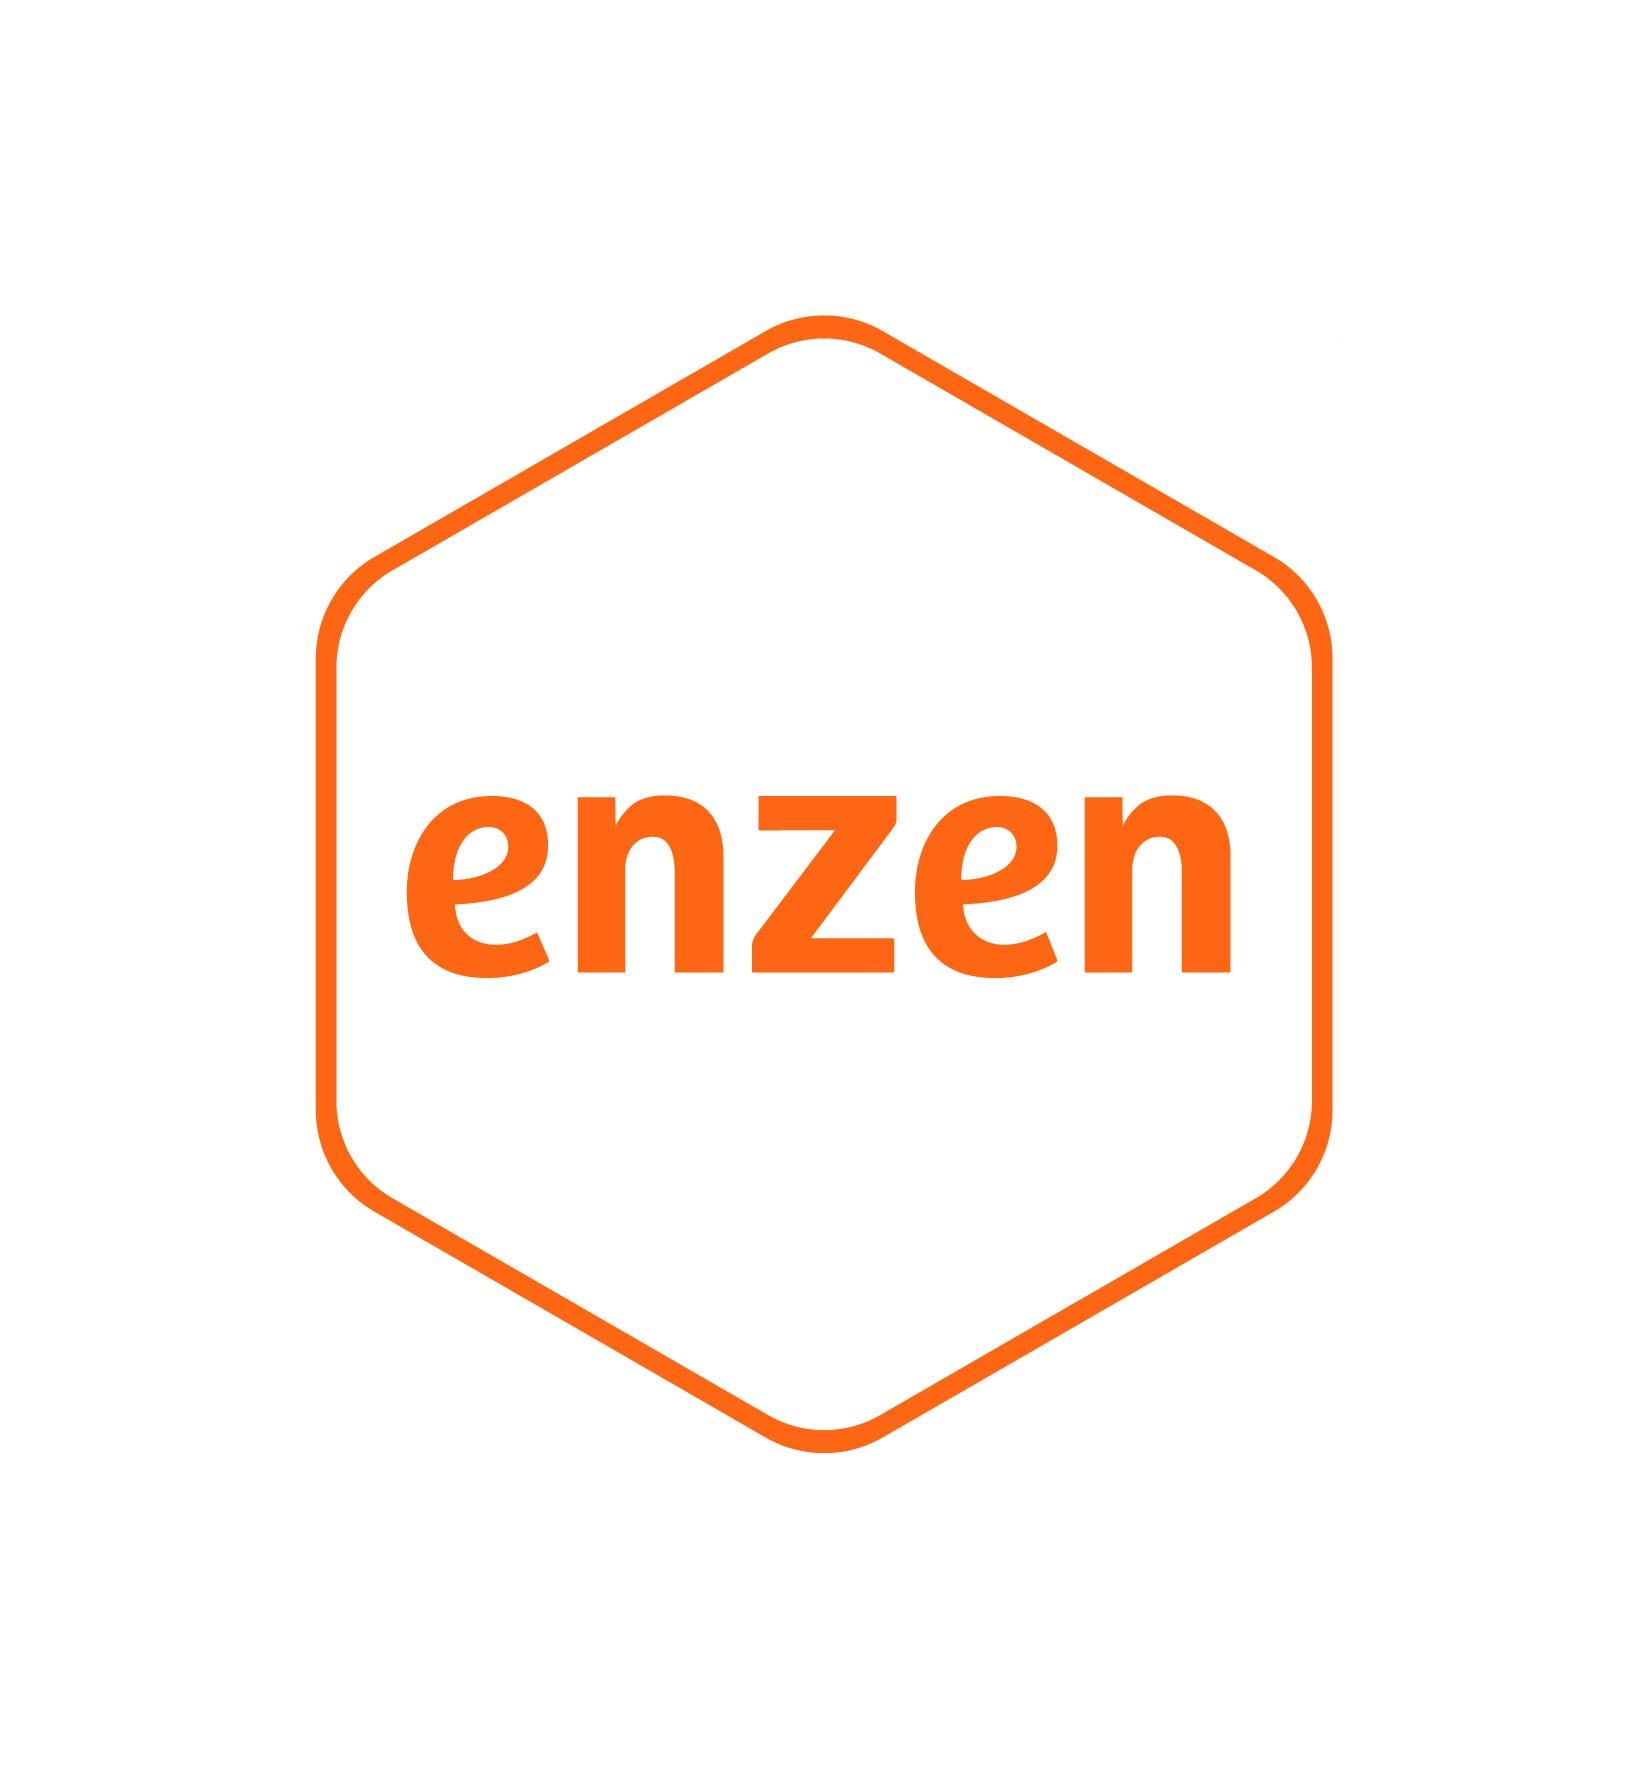 Enzen_Logo_OnScreen_RGB.jpg